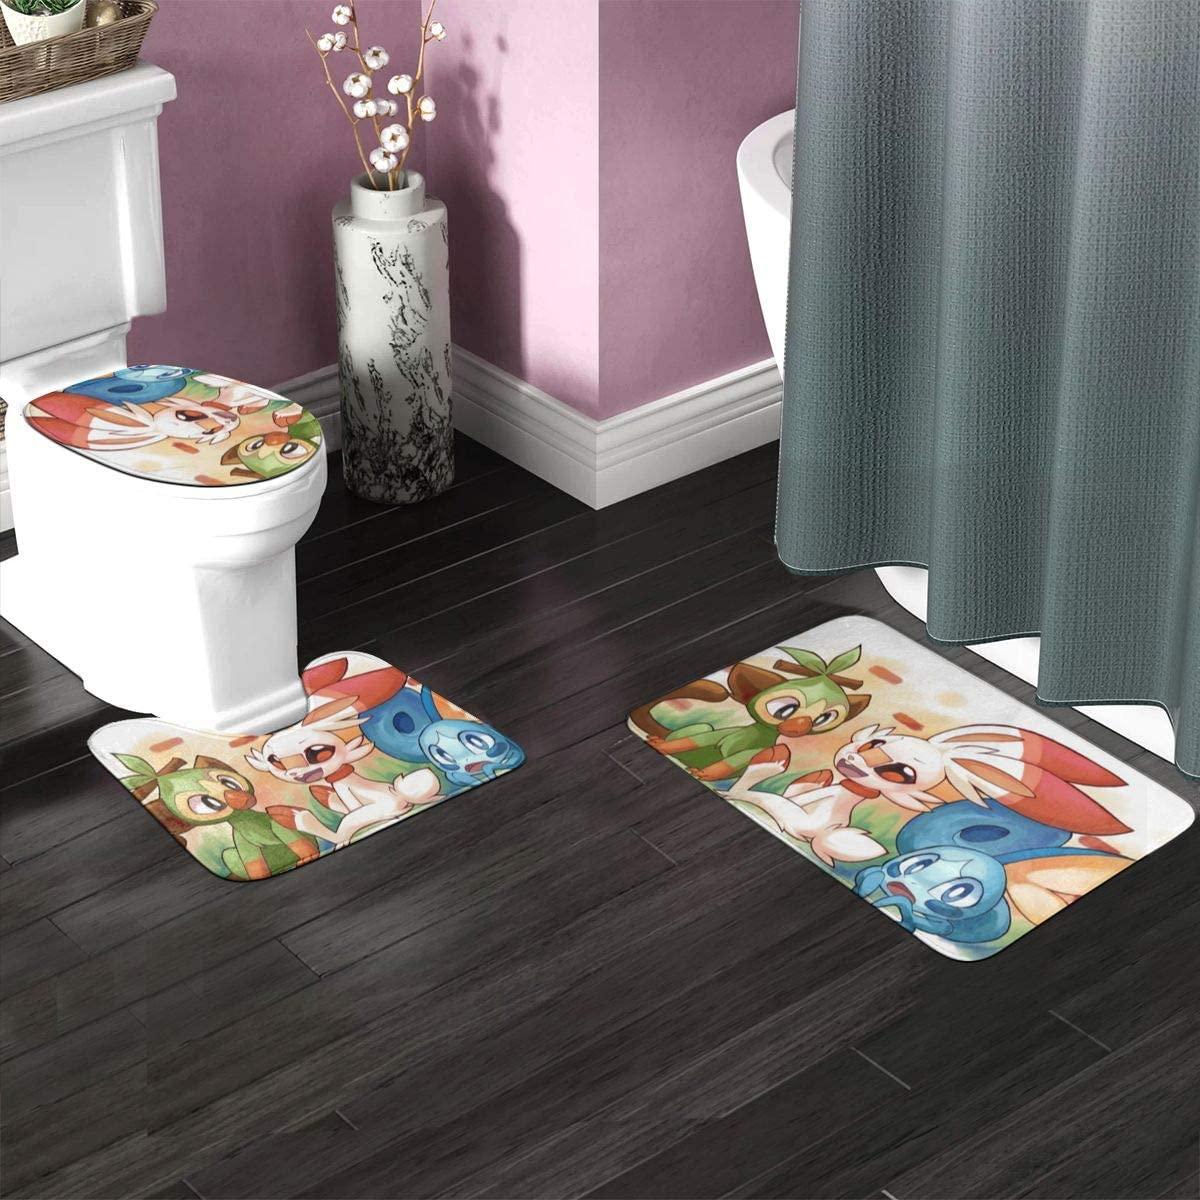 3pc Bathroom Rug Set 35.4